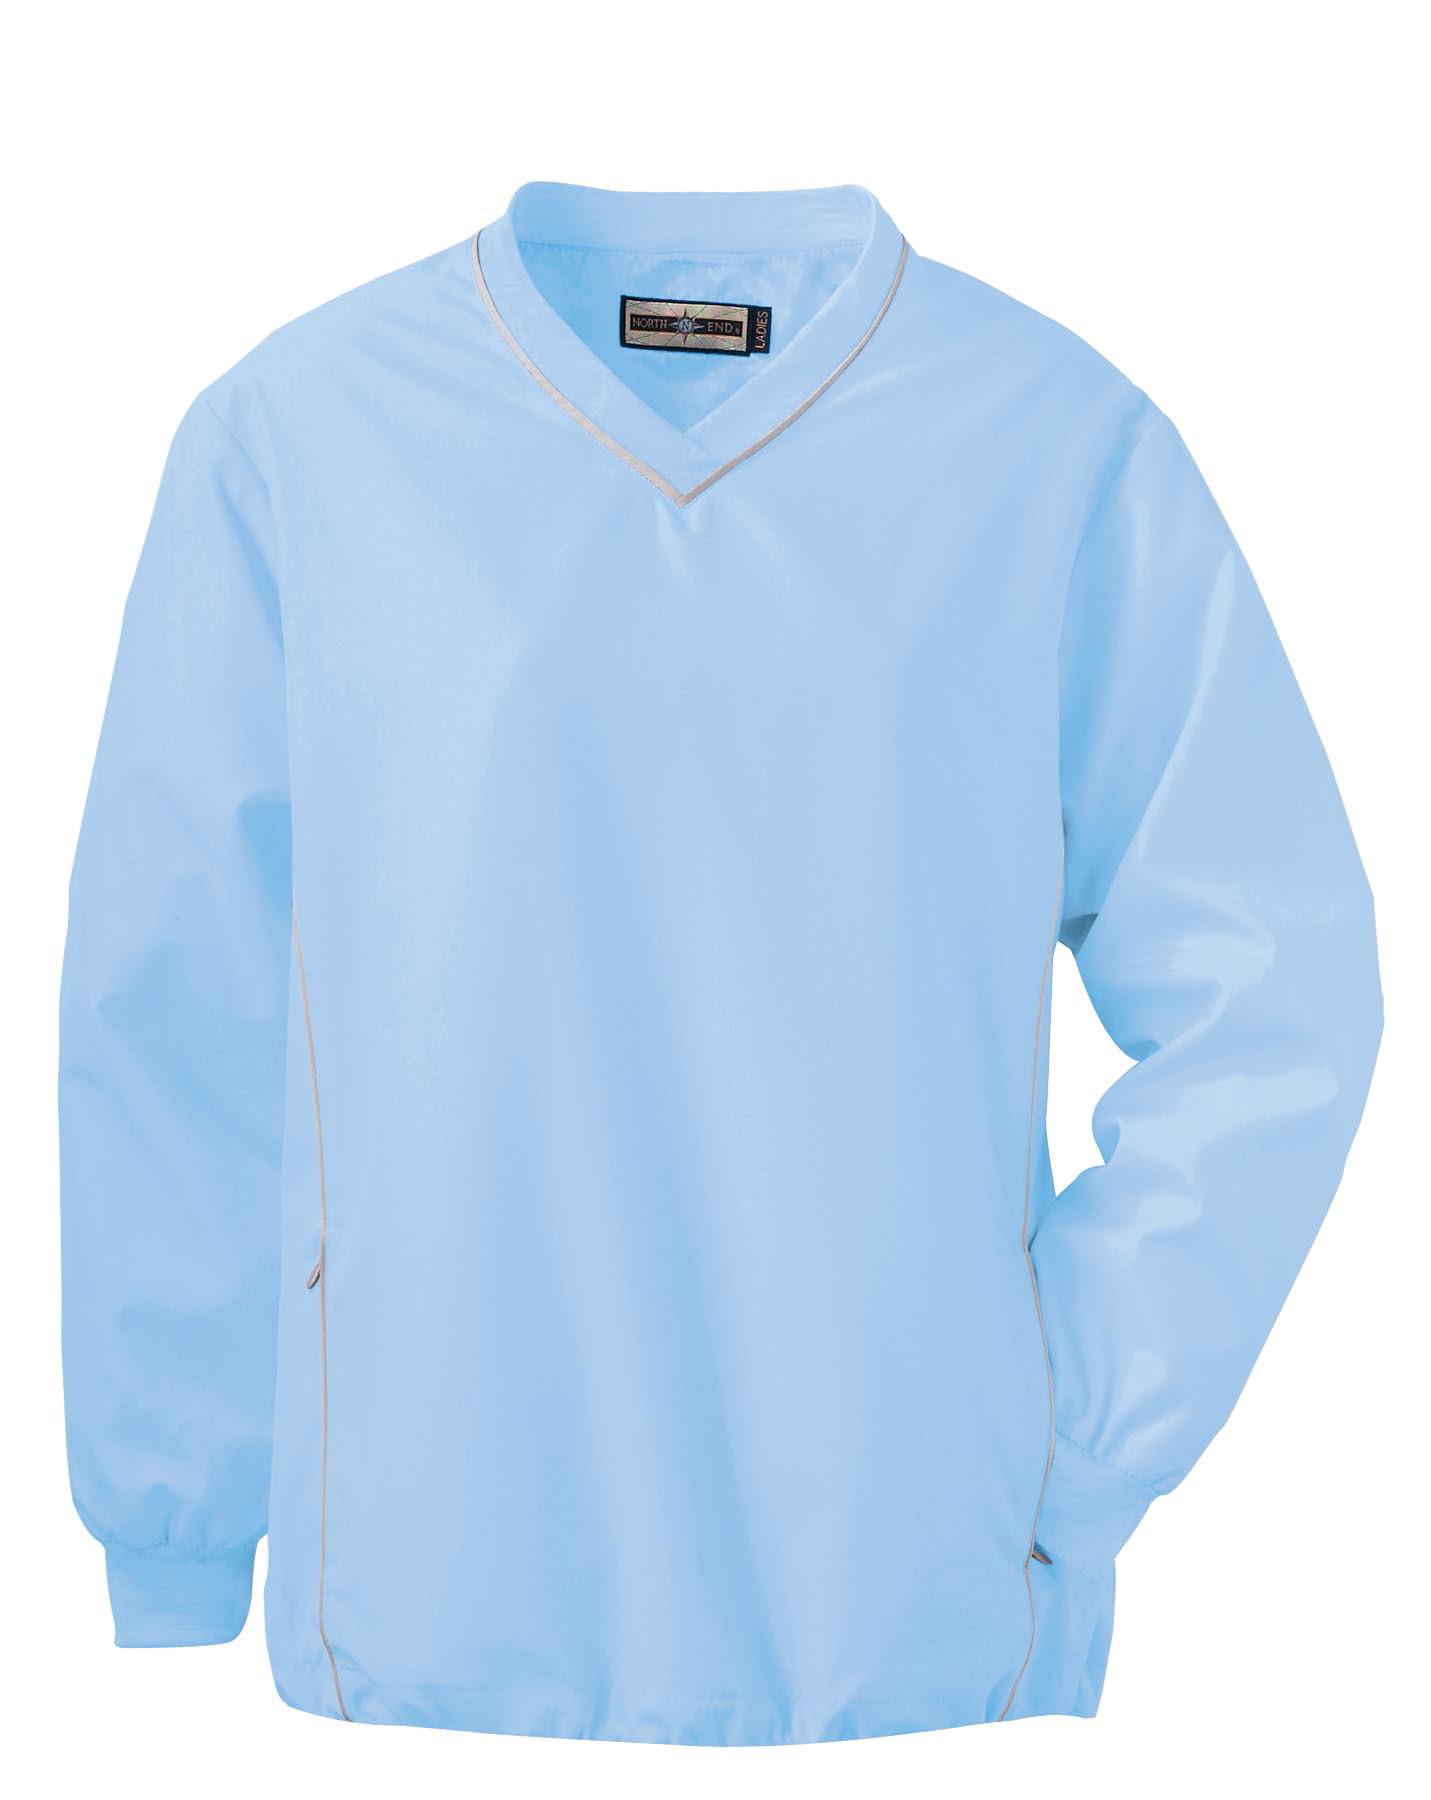 Ash City Windshirts 78023 - Ladies' Micro Plus Windshirt With Teflon